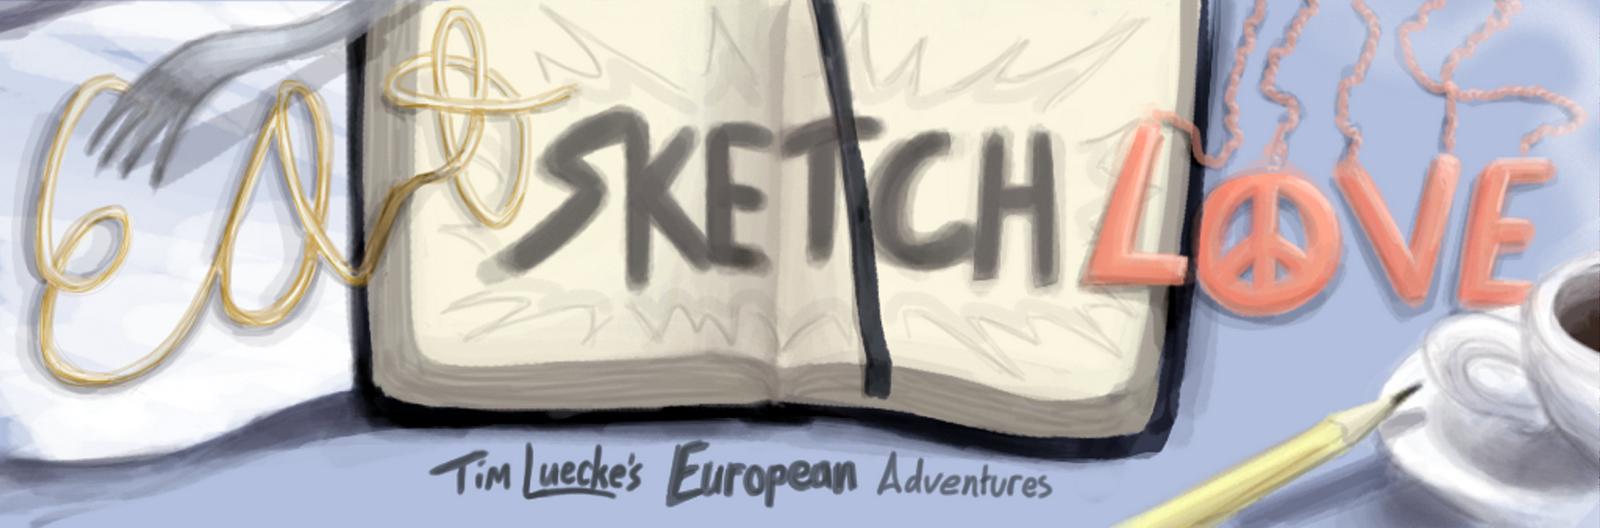 Eat Sketch Love: Tim Luecke's European Adventures